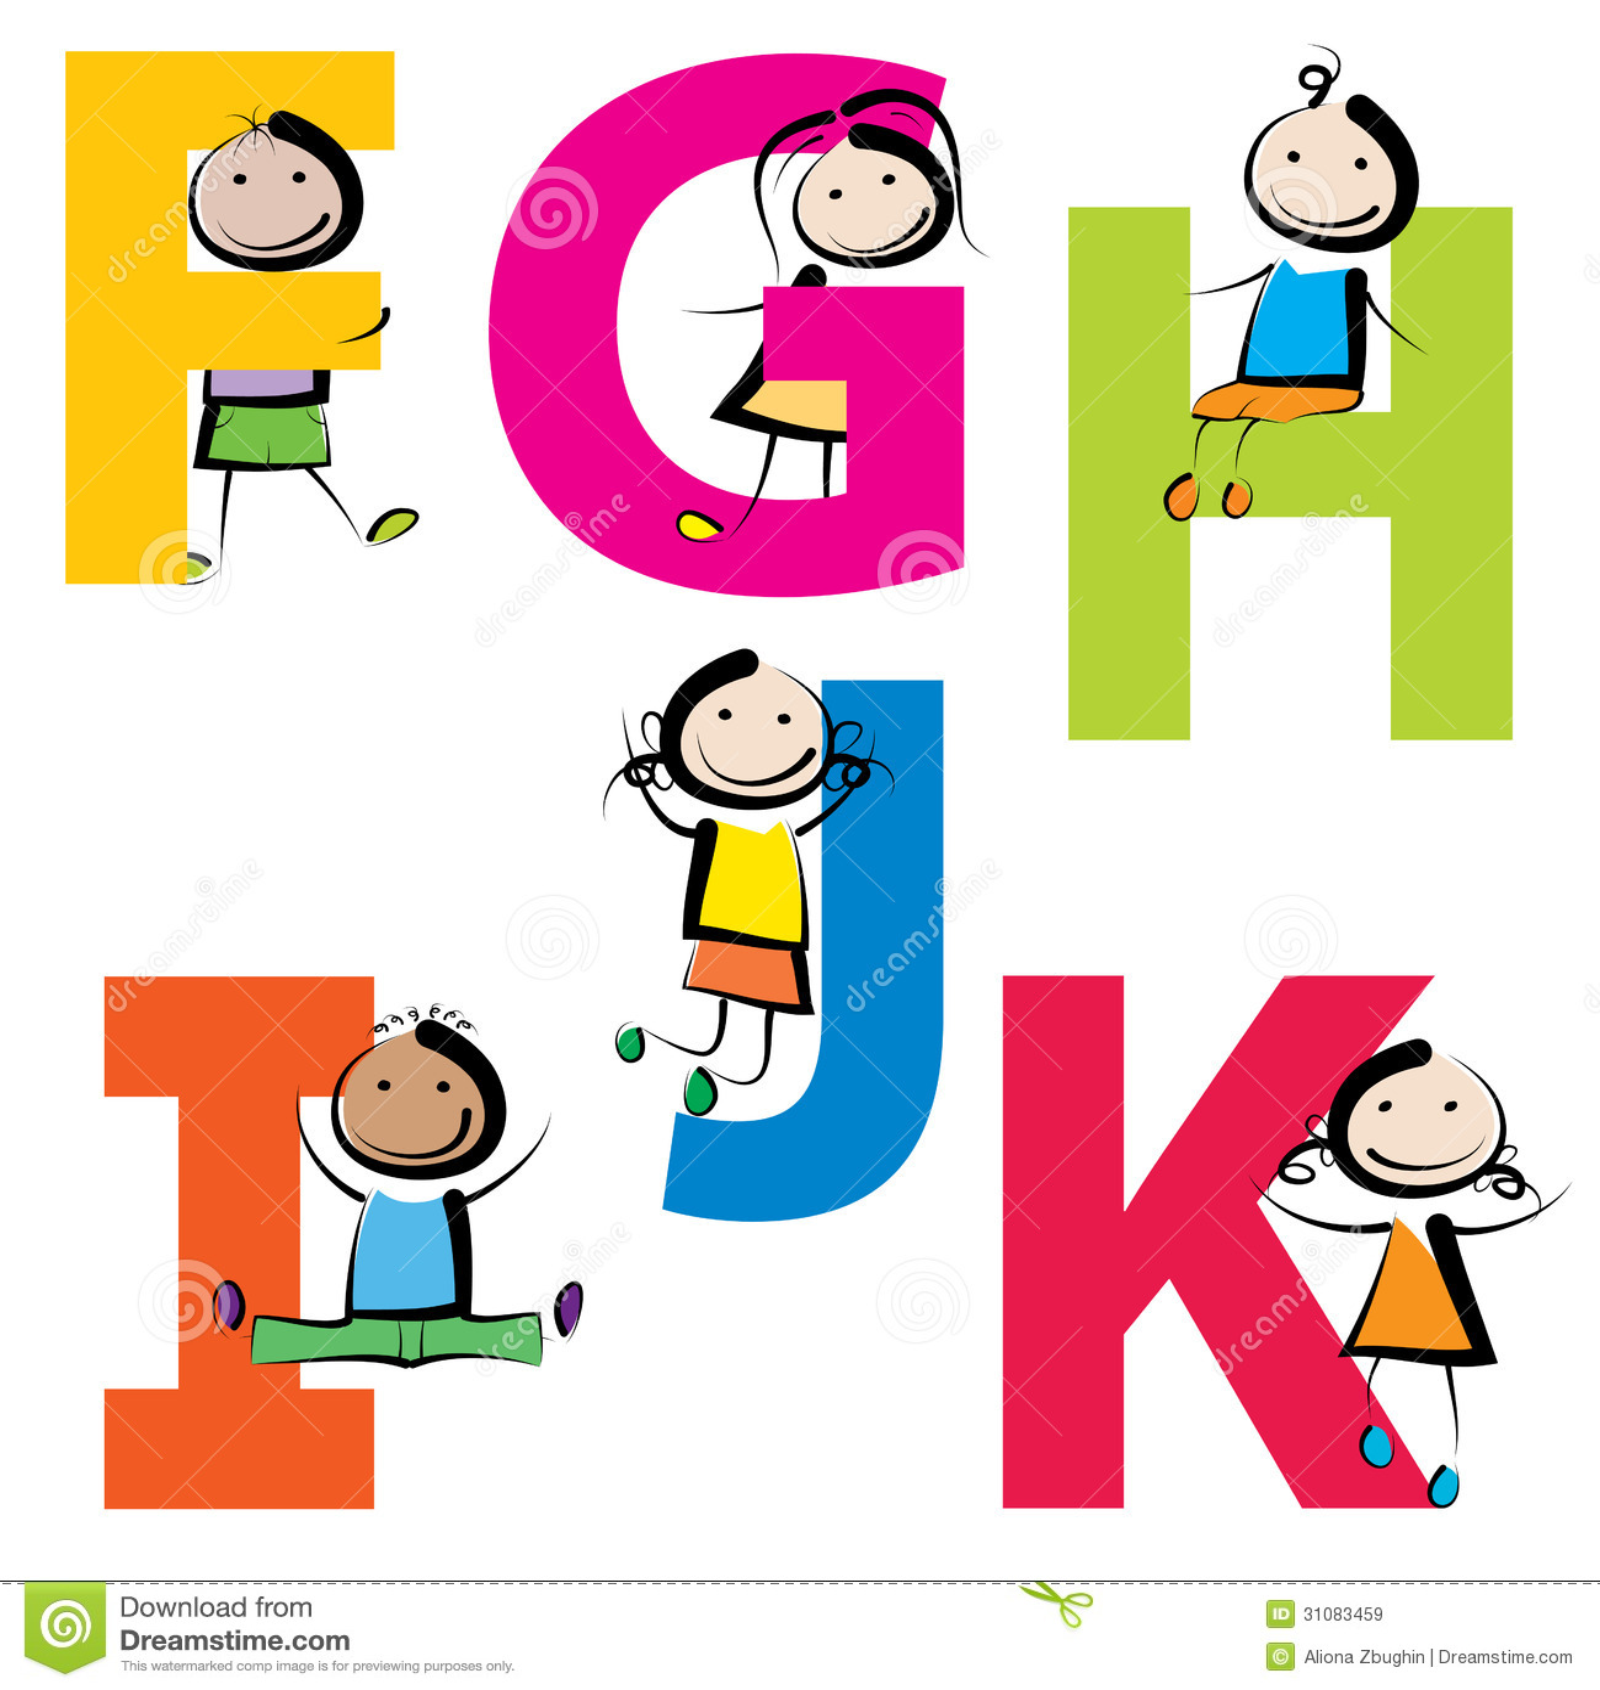 6 Letter Cartoon Characters : Kinder mit buchstaben fk lizenzfreie stockbilder bild